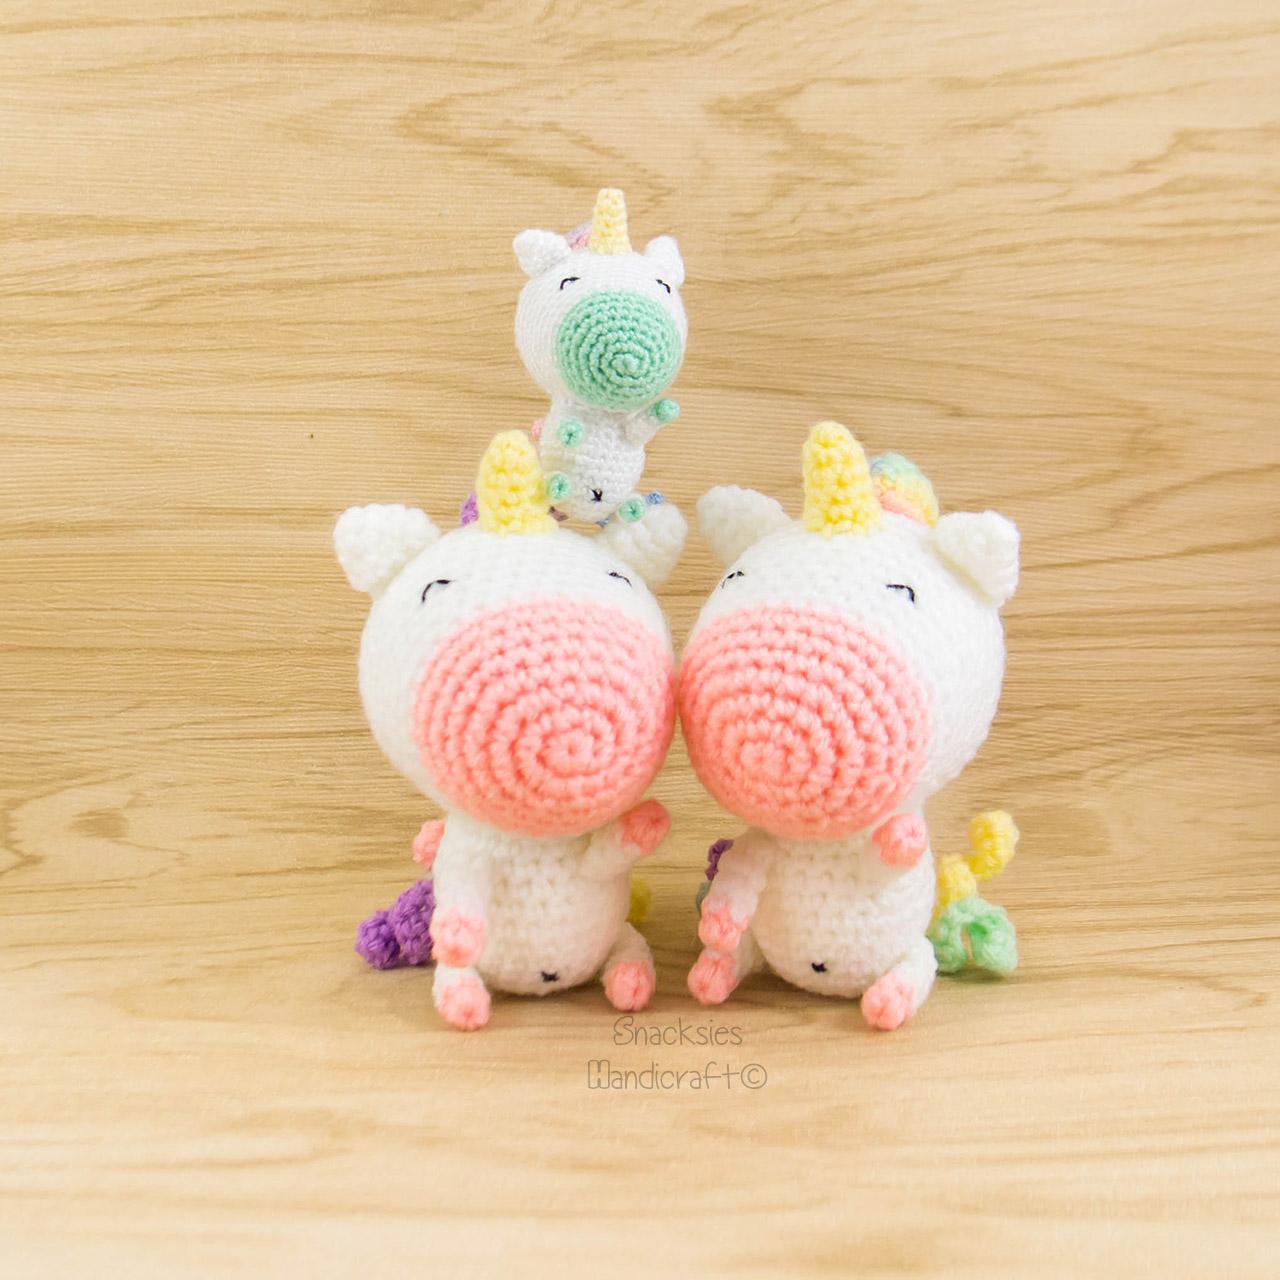 20 Most Amazing Unicorn Amigurumi Patterns   Crochet Arcade   1280x1280